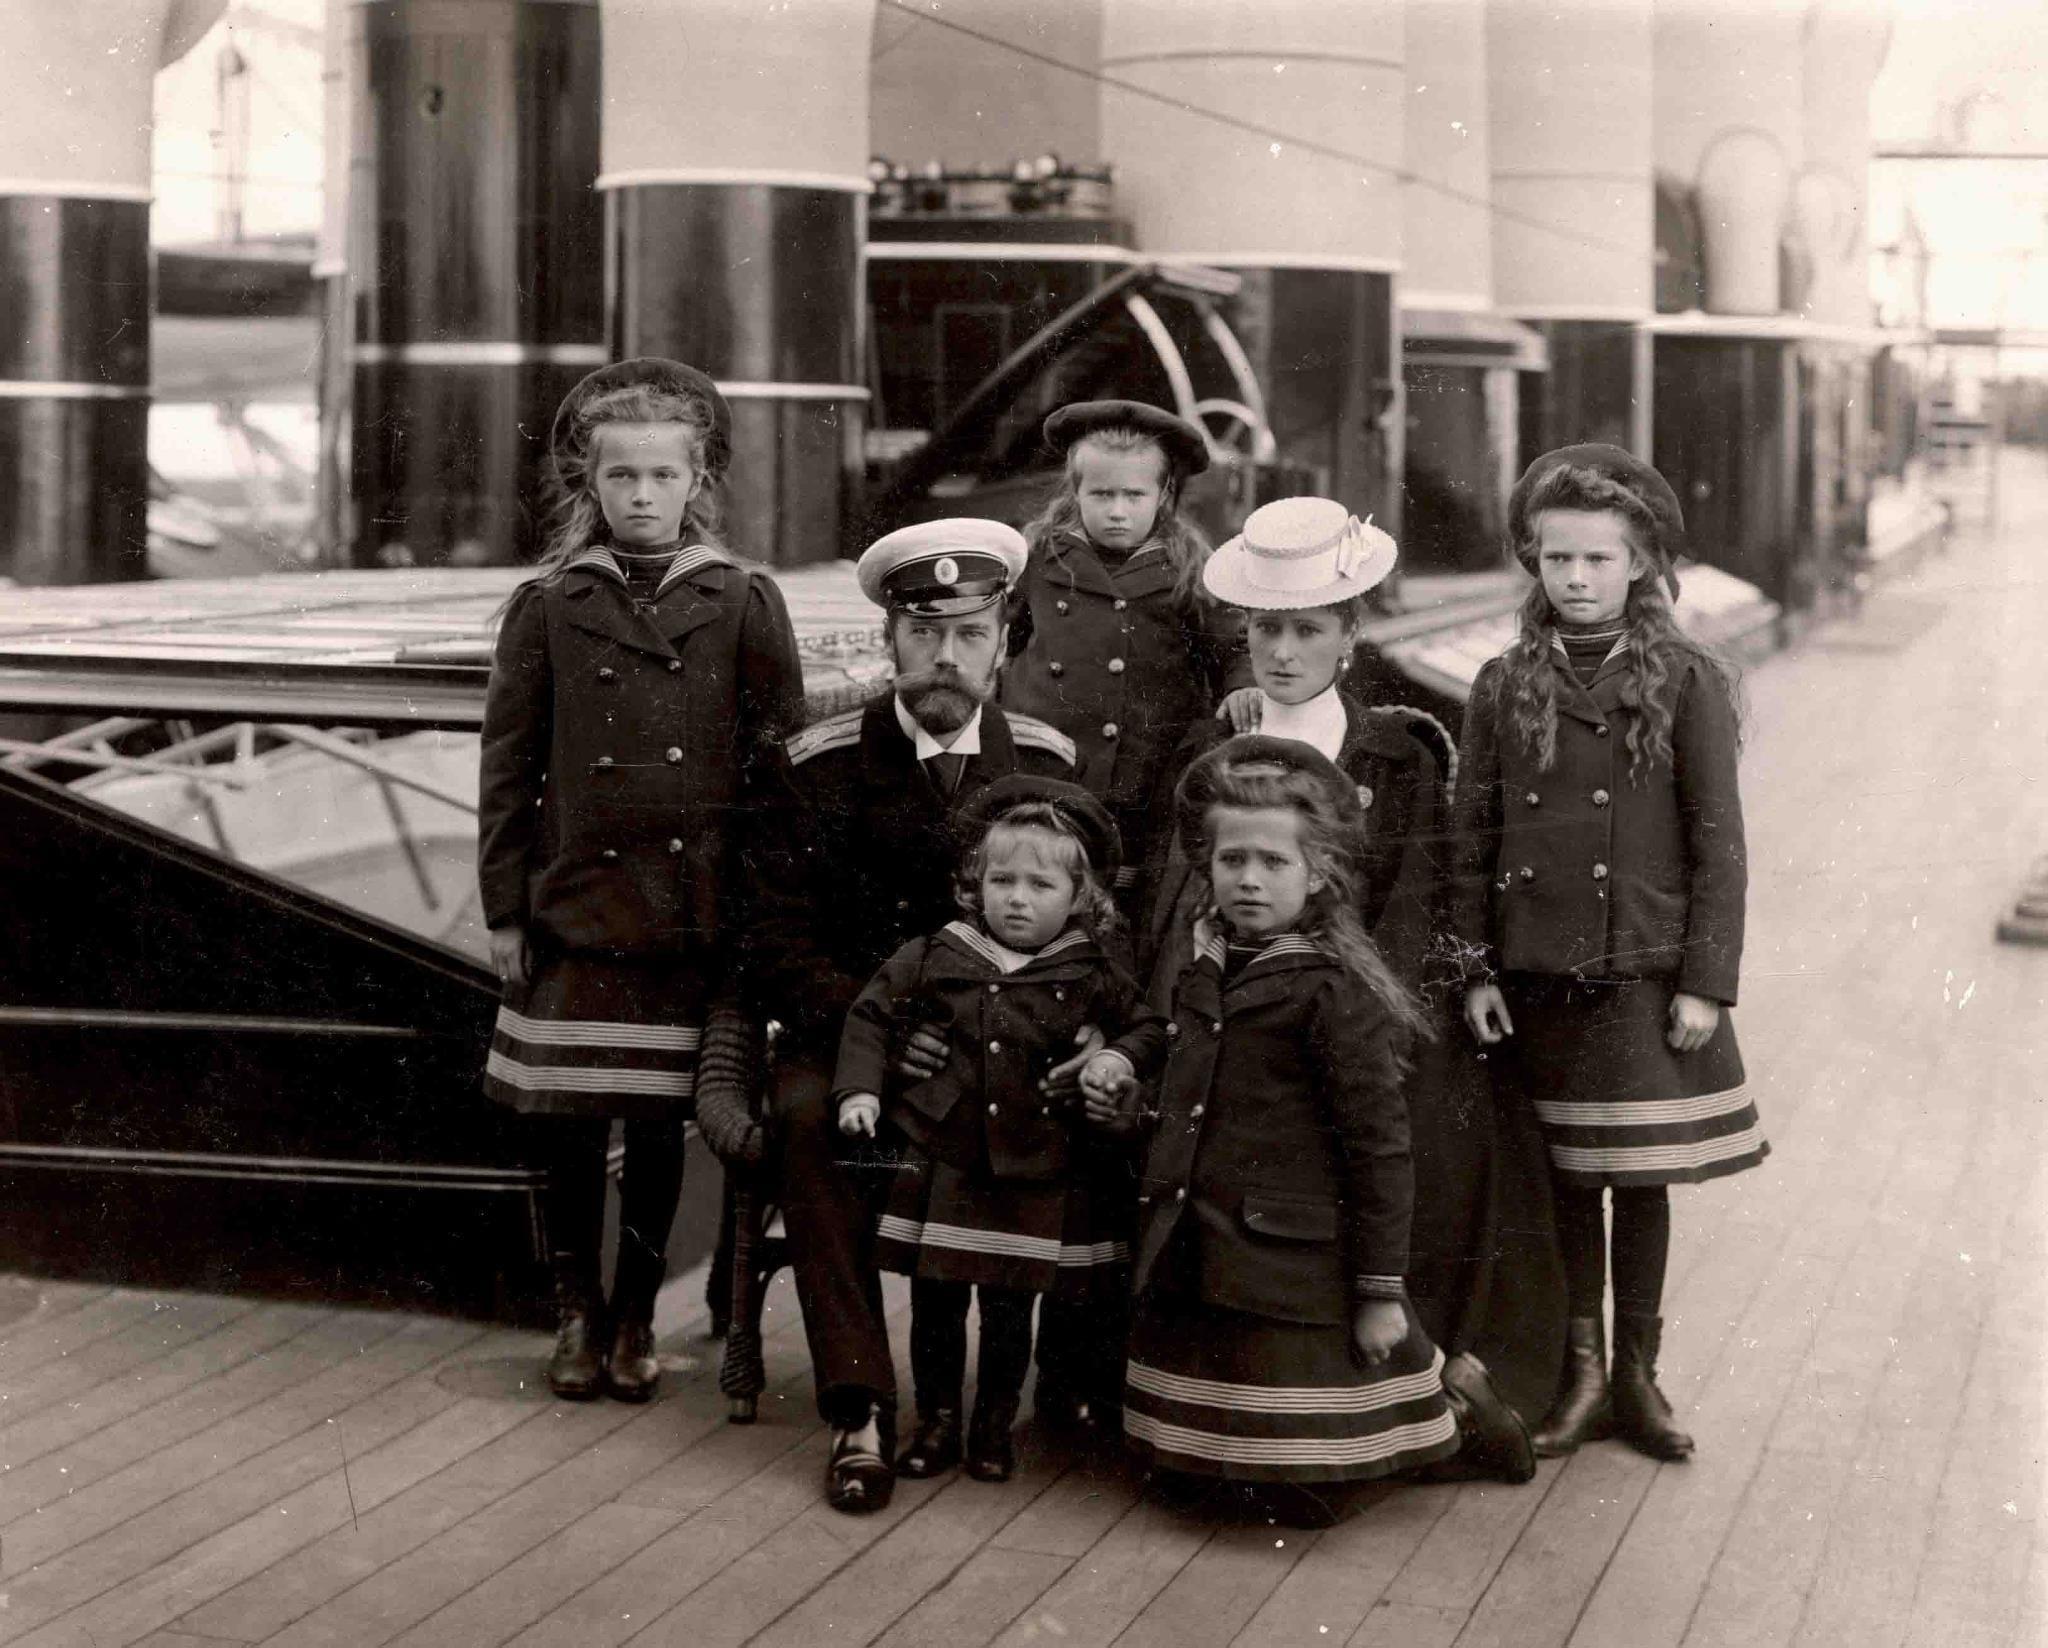 Nicholas II Romanovs Ekaterinburg Imperial Yacht